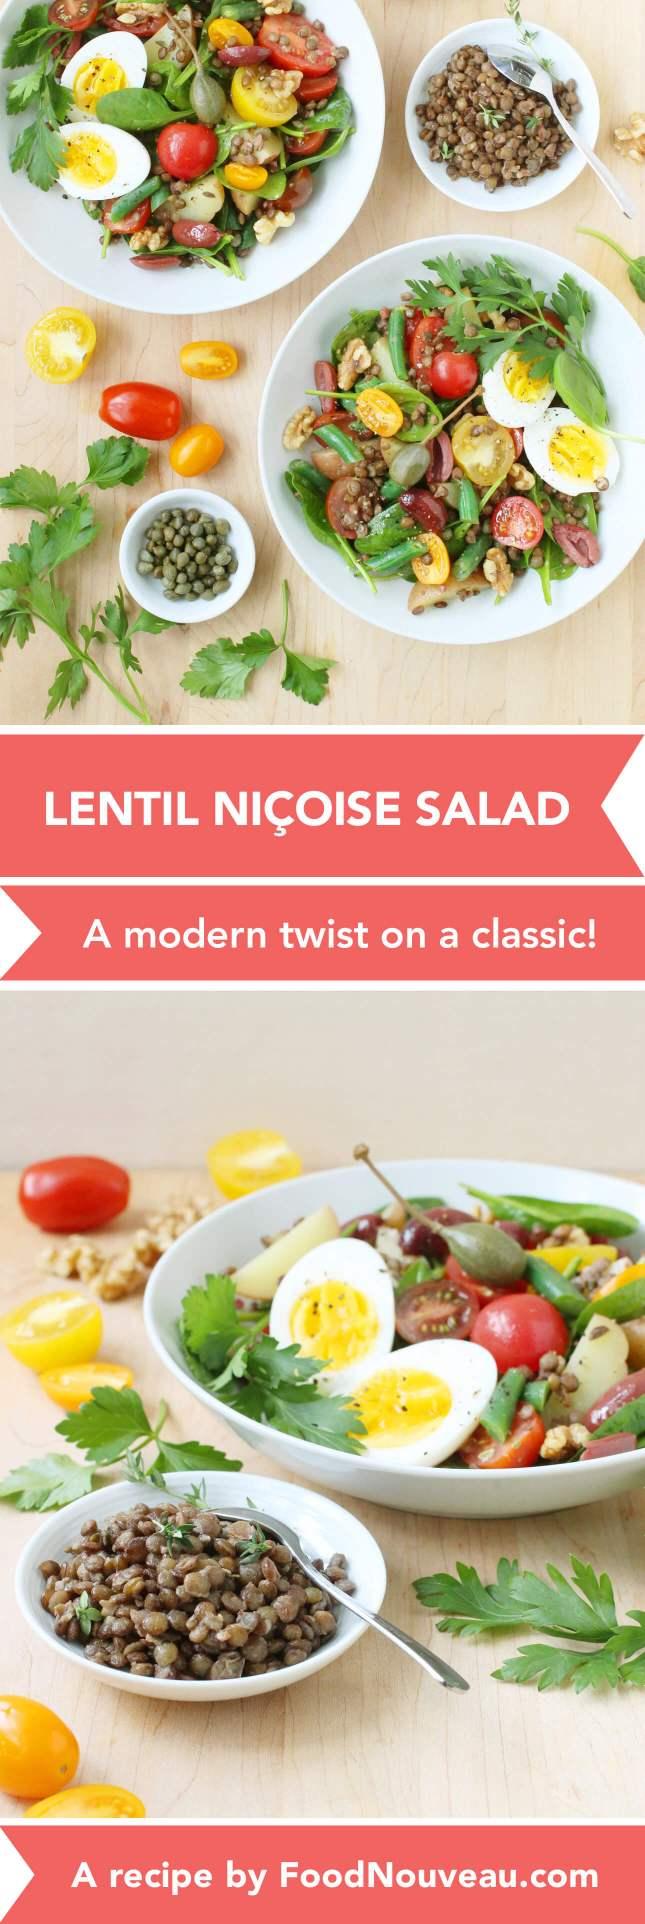 Lentil Niçoise Salad: A modern twist on a classic! // FoodNouveau.com